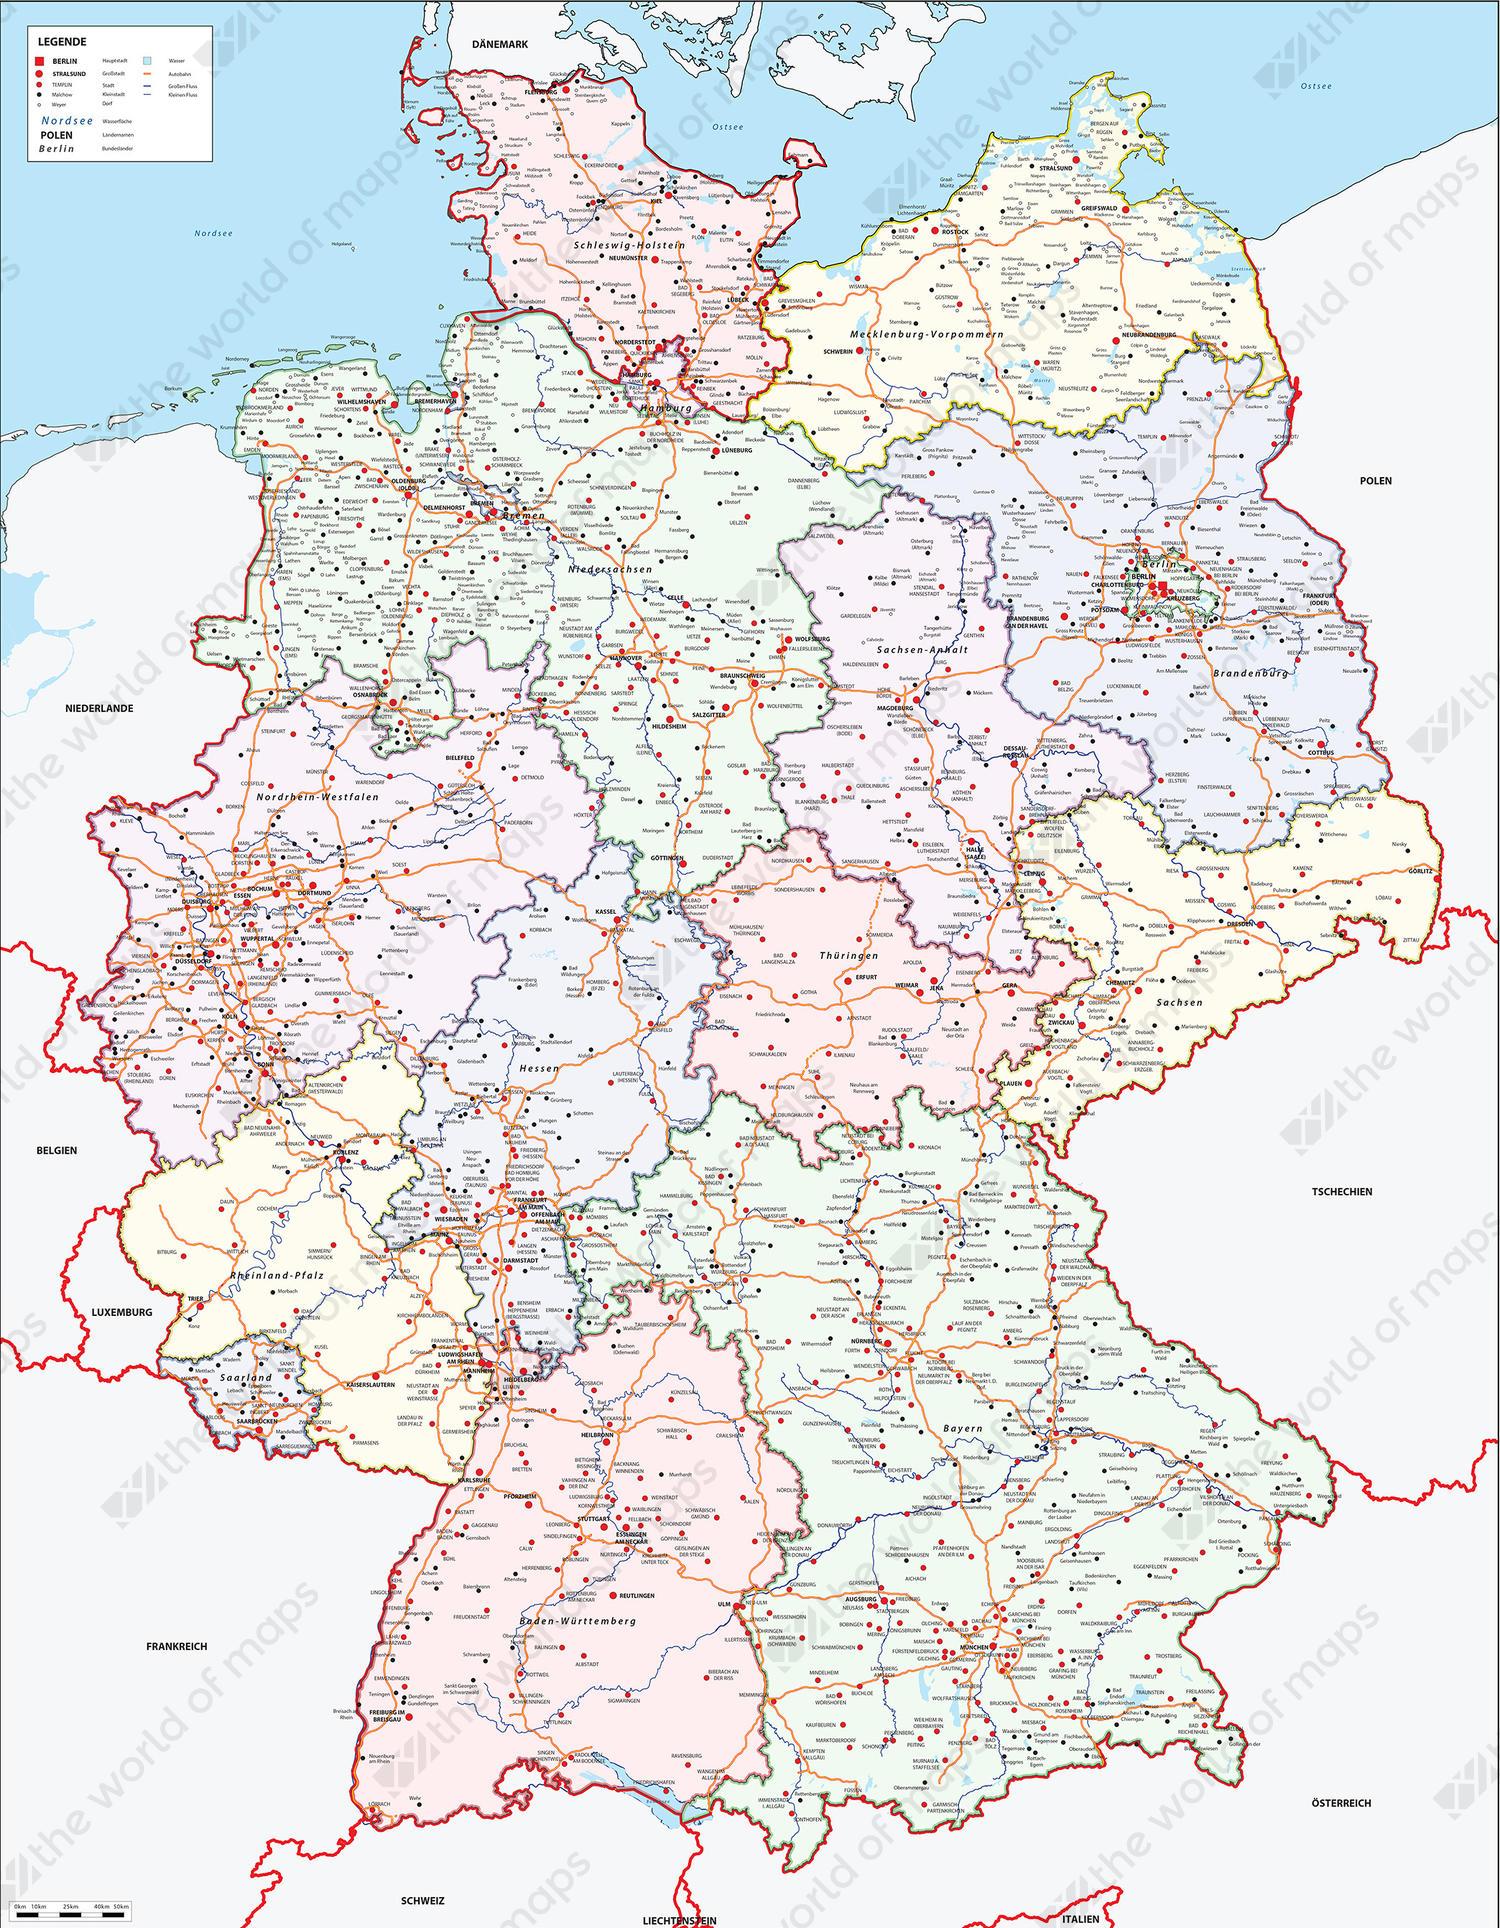 Digital map Germany